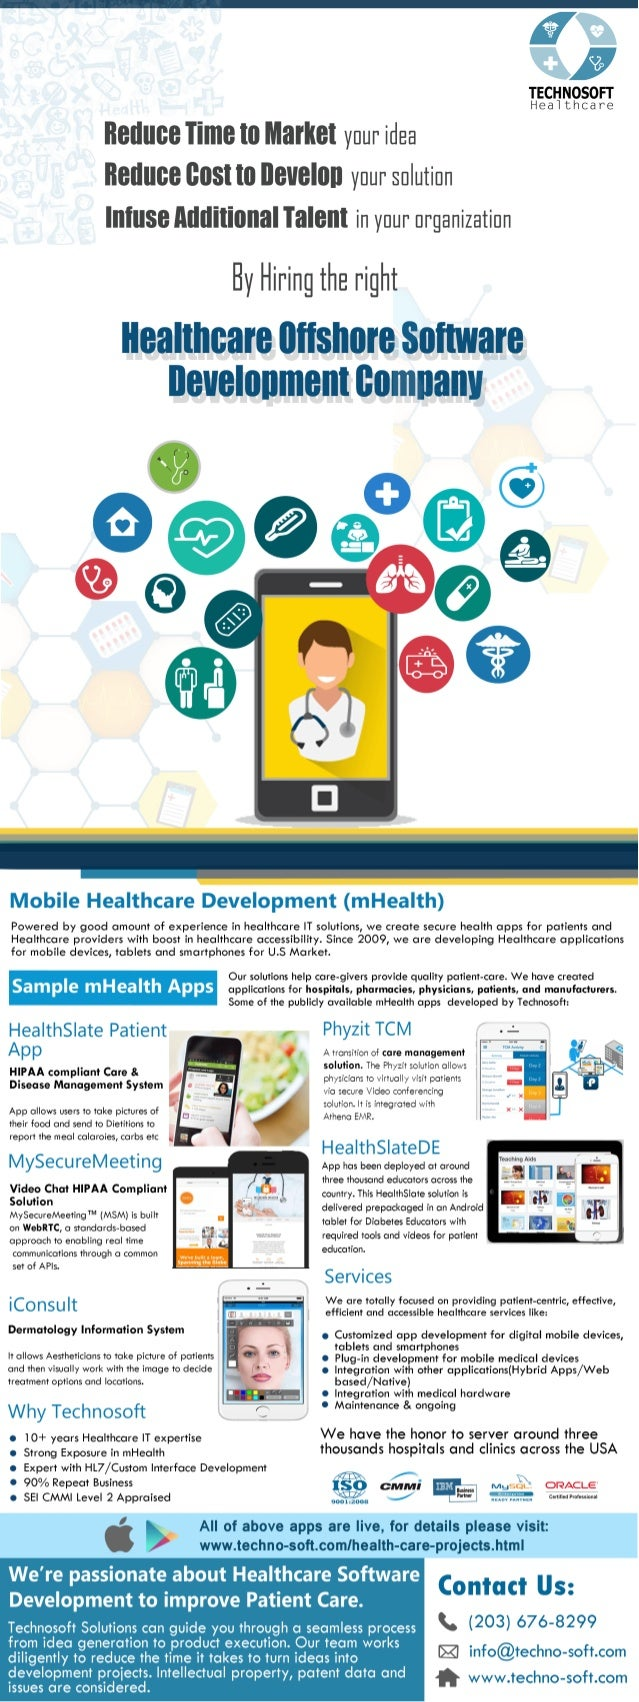 Mobile Healthcare App Development (mHealth)